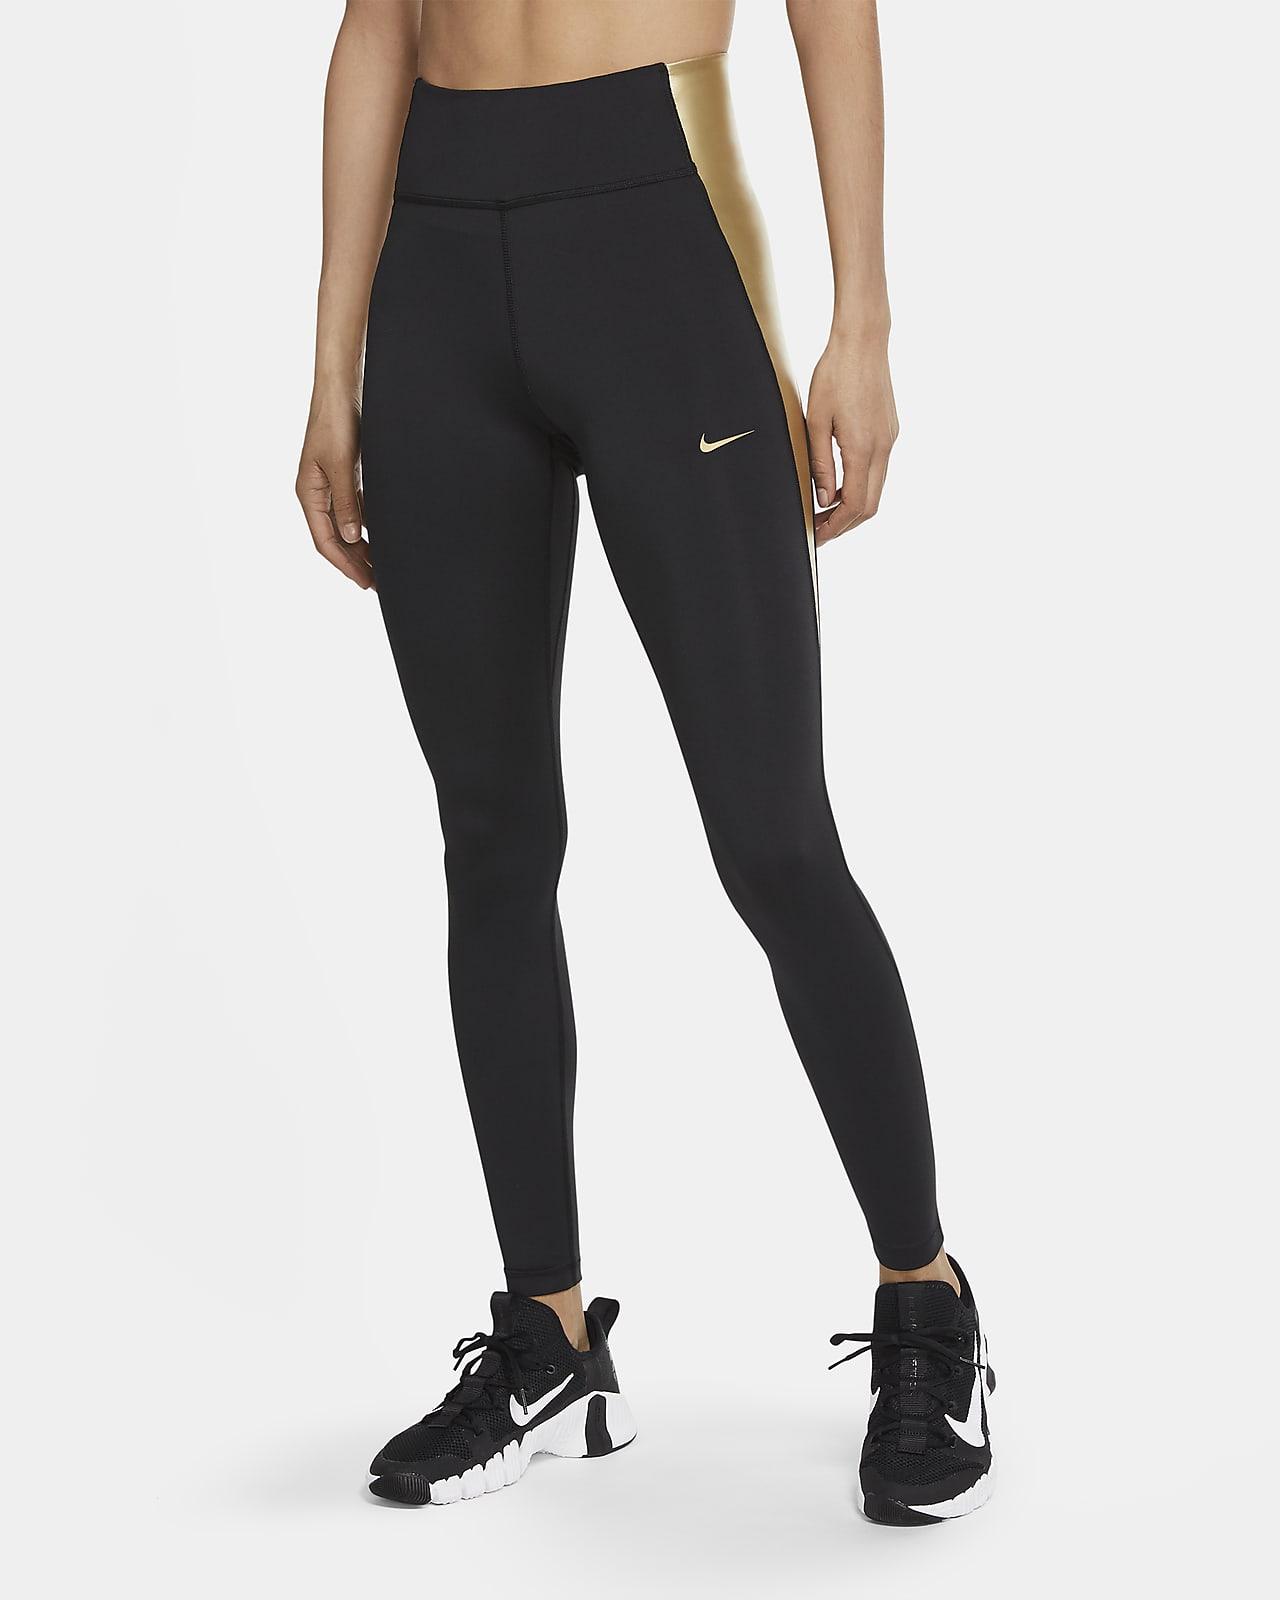 Mallas para mujer Nike One